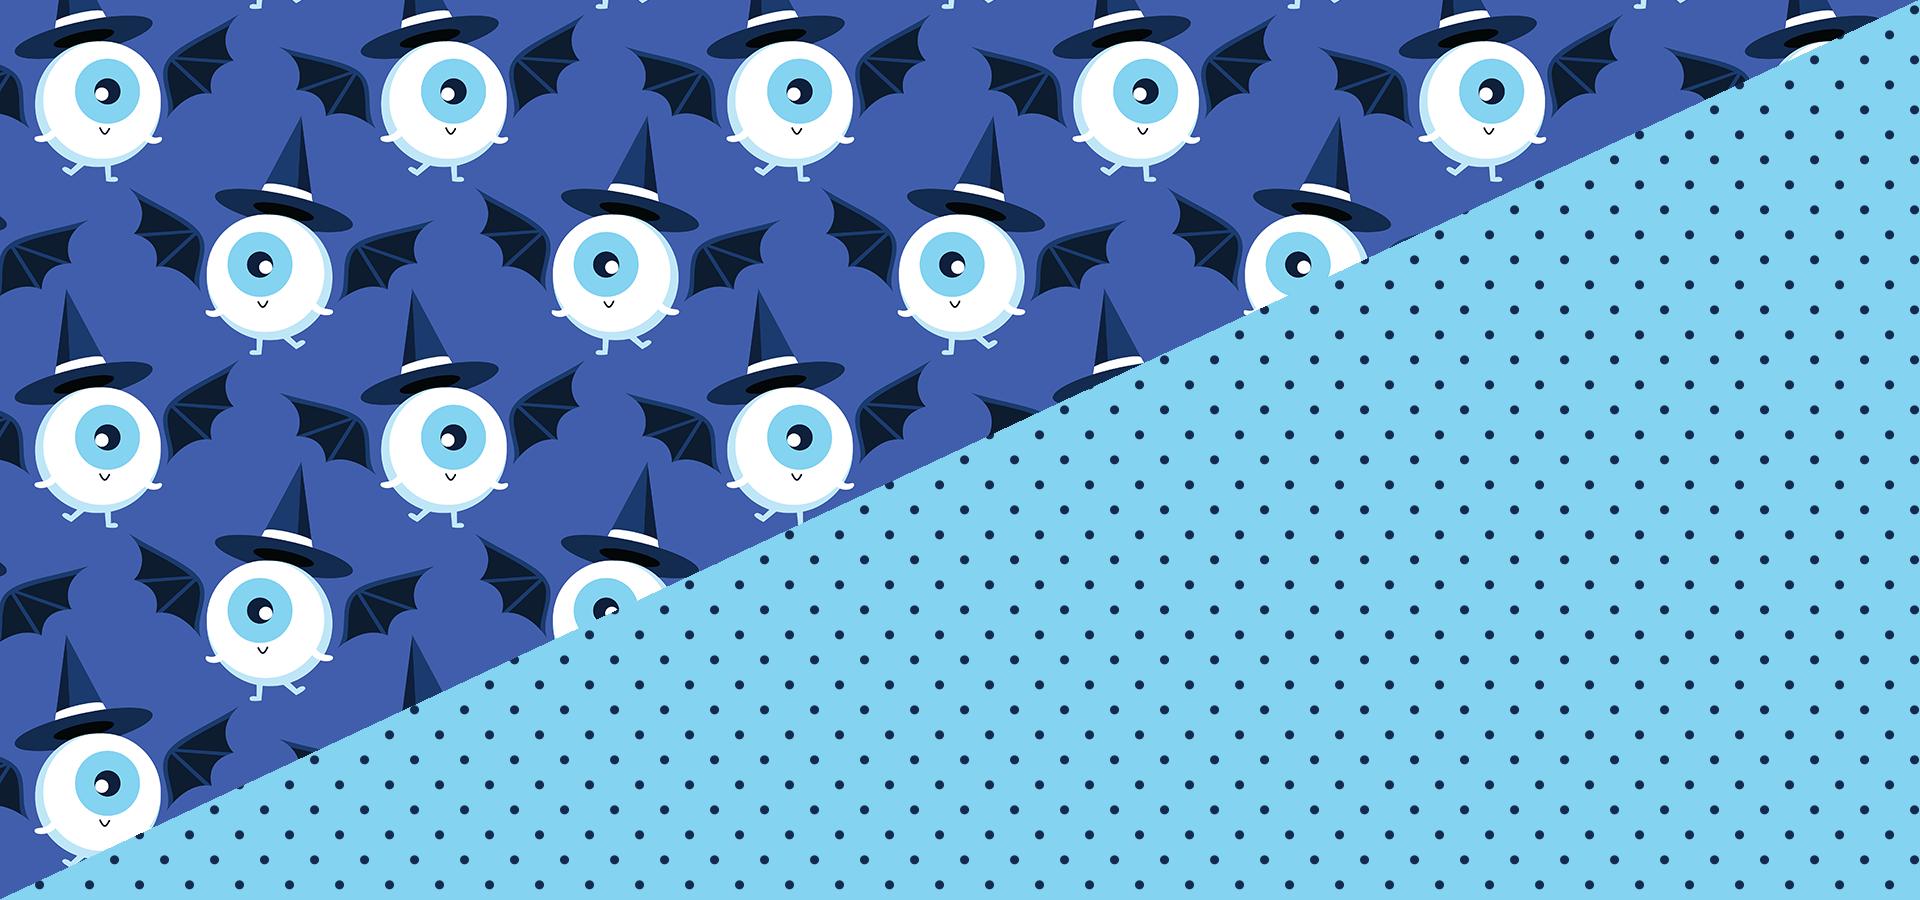 evil eye dance pattern collection